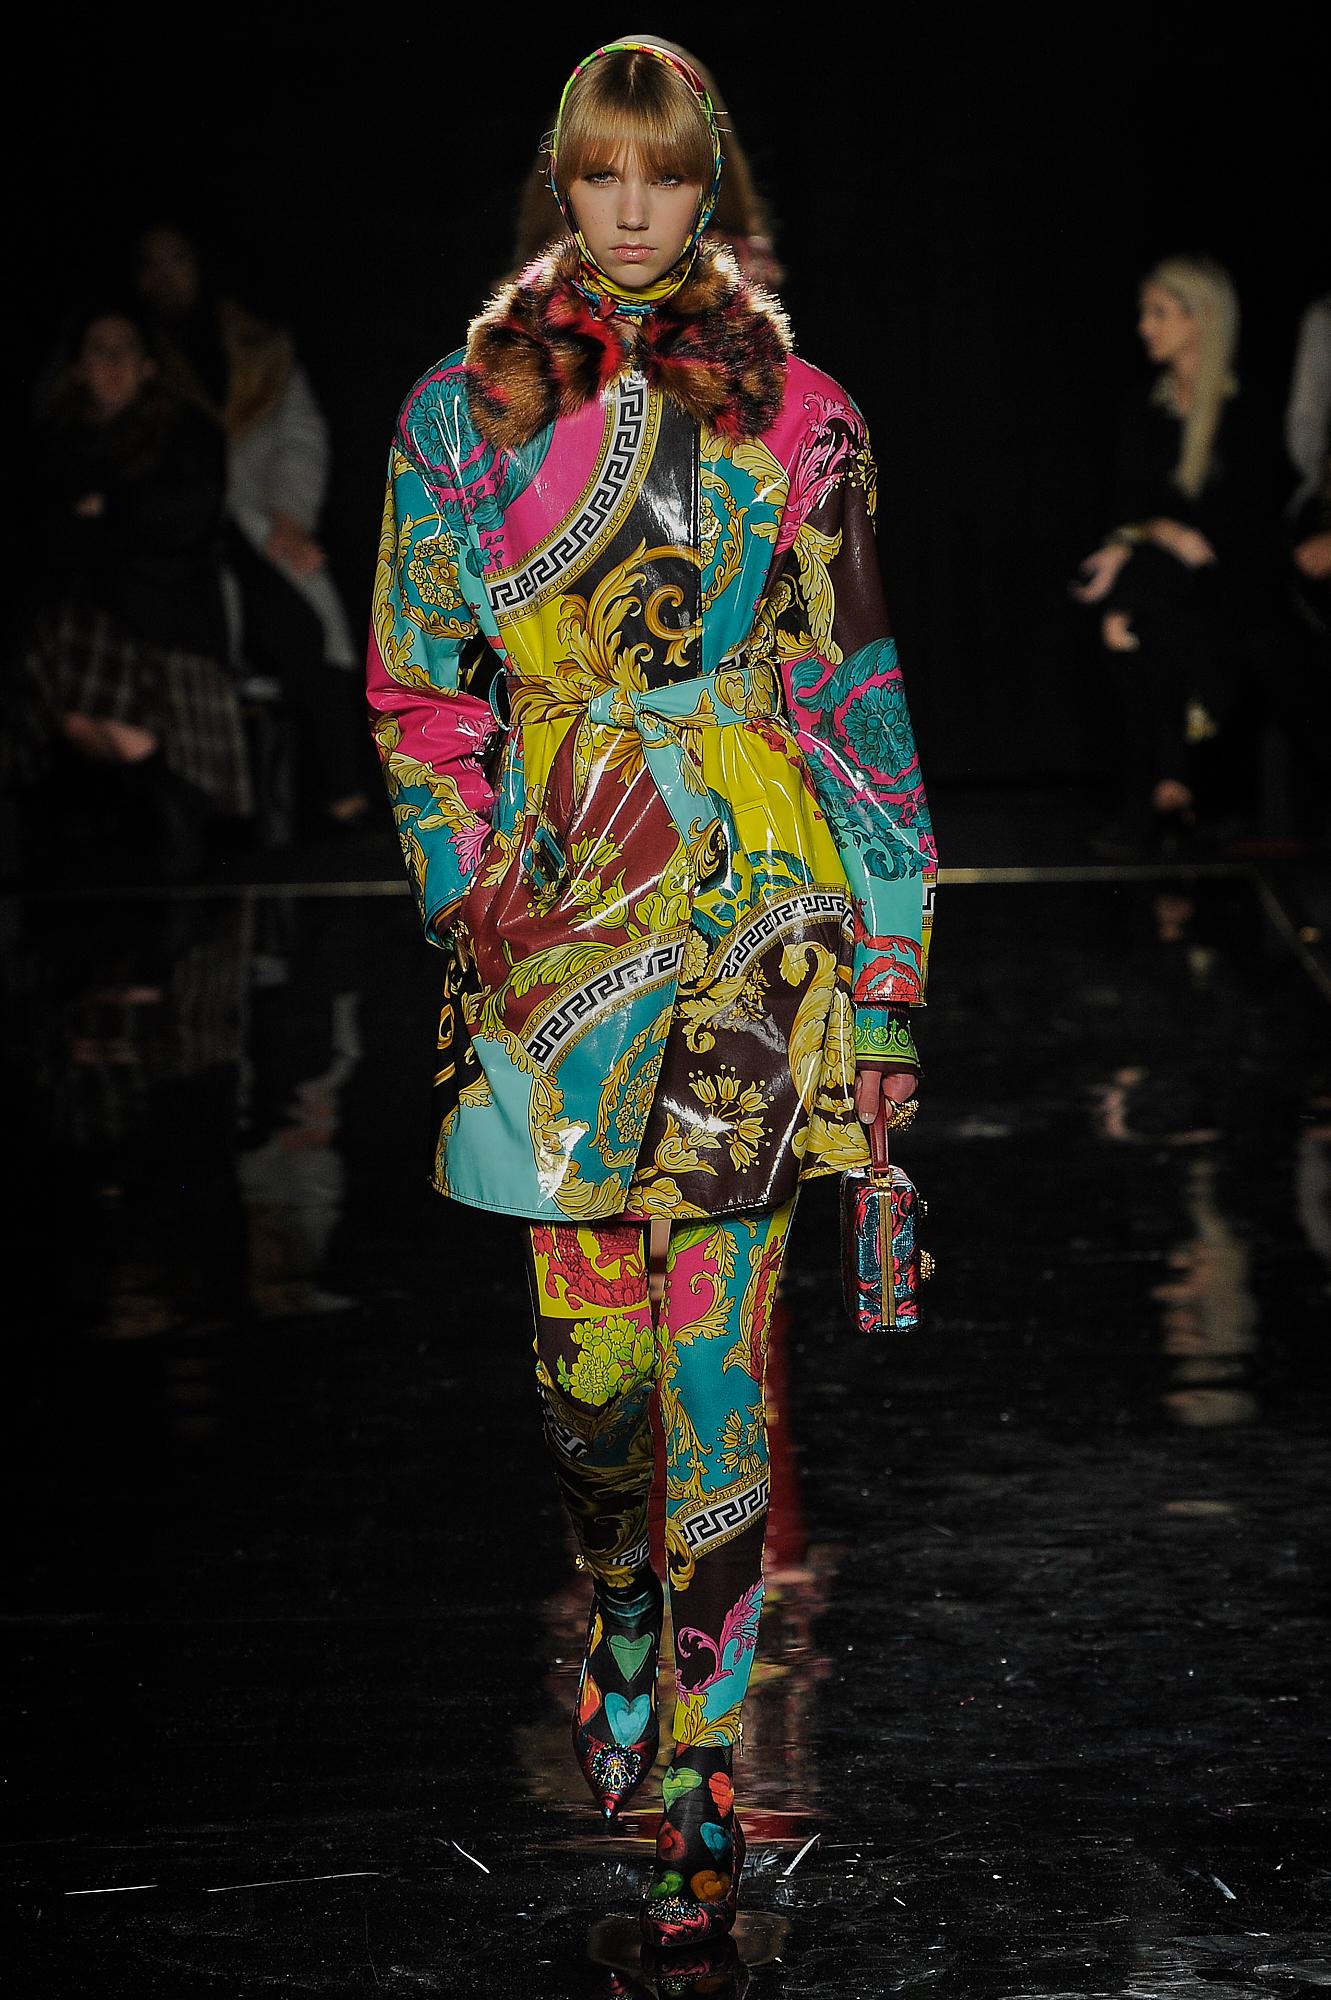 Versace_37_5e_versace_runway_runway_00037.jpg